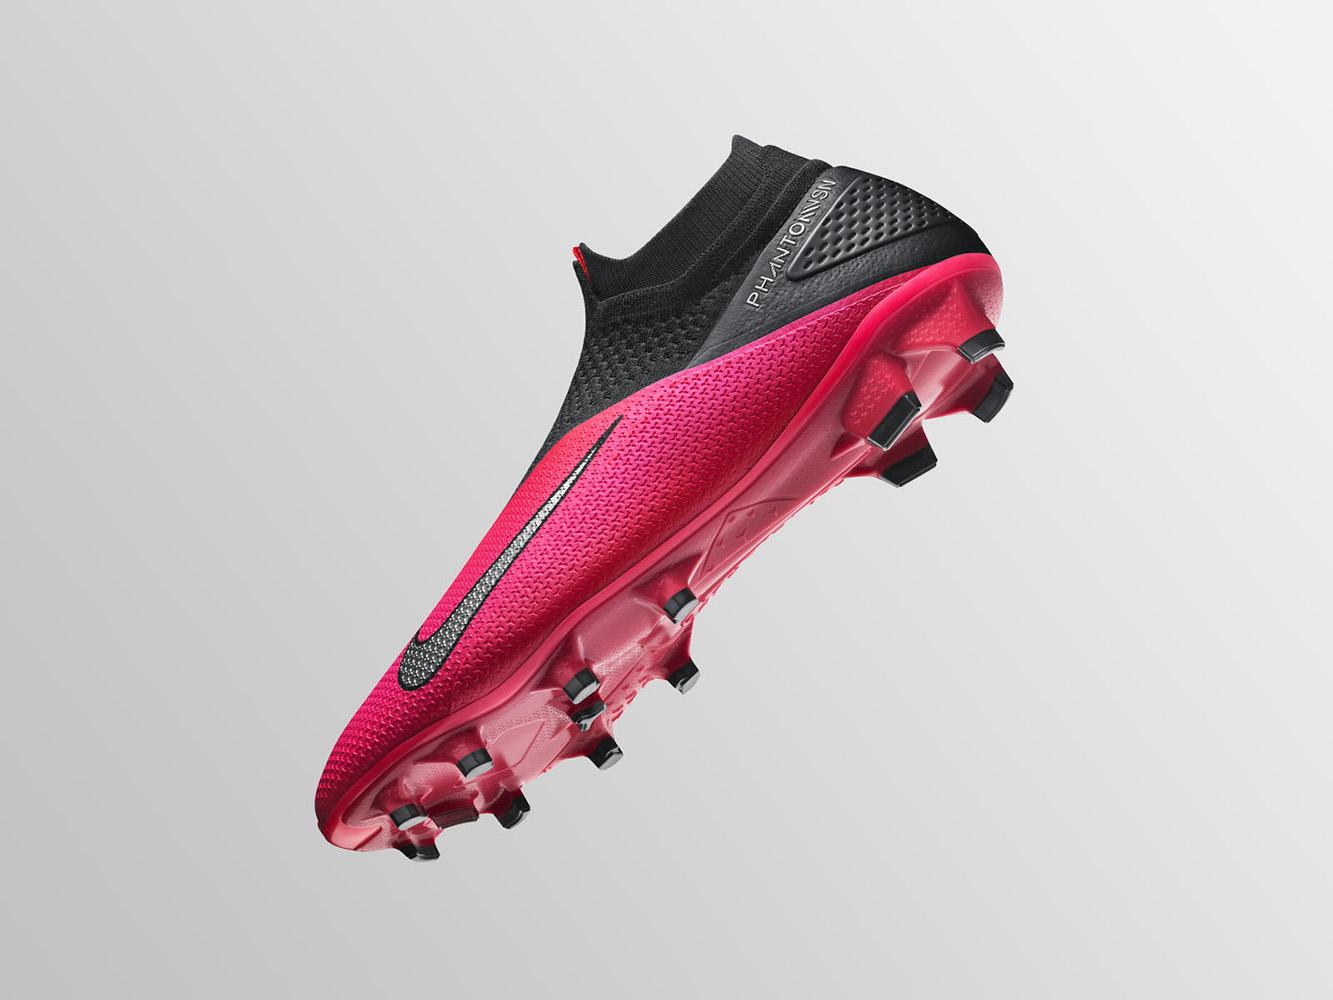 Nike_Football_PhantomVSN2_EliteFG_ProductAngle_93358